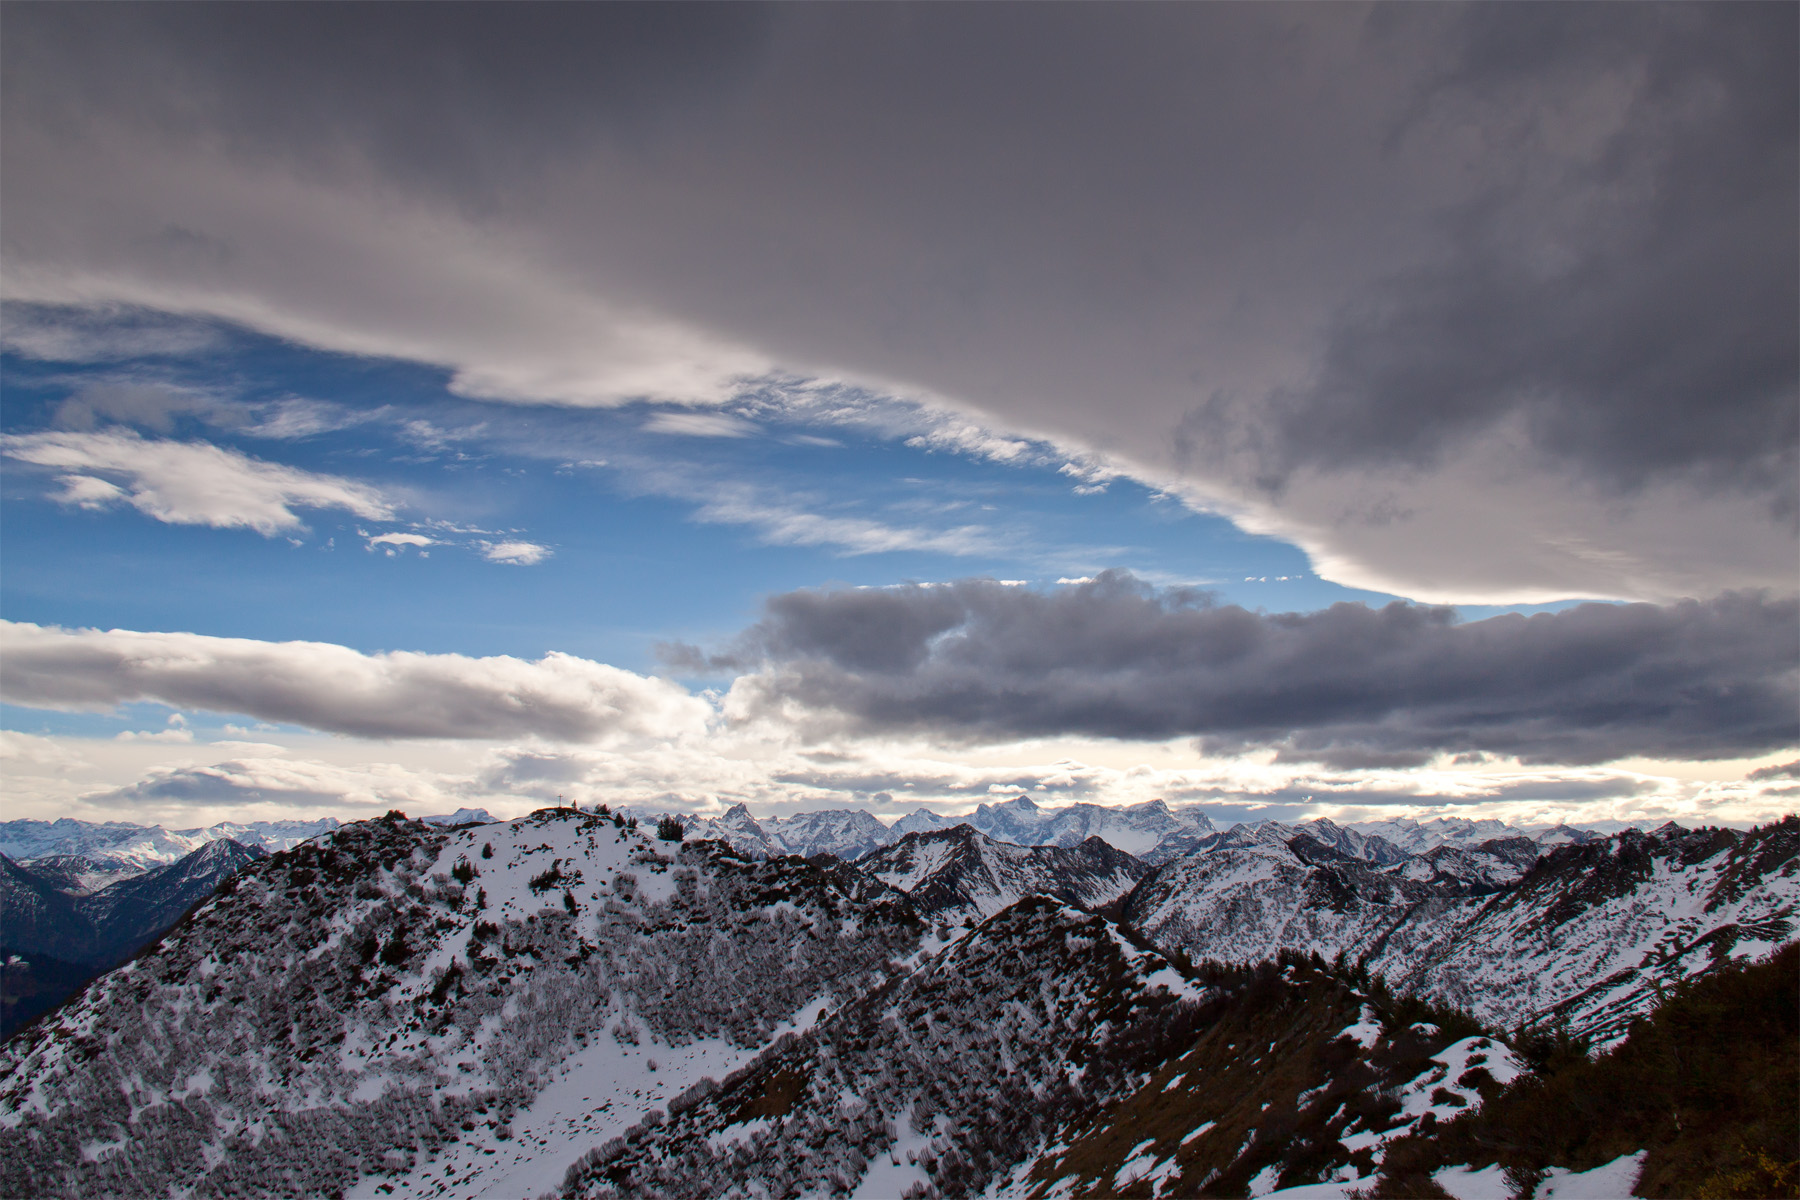 Himmelskeil überm Rätikon, Gipfelkreuz Pfrondhorn